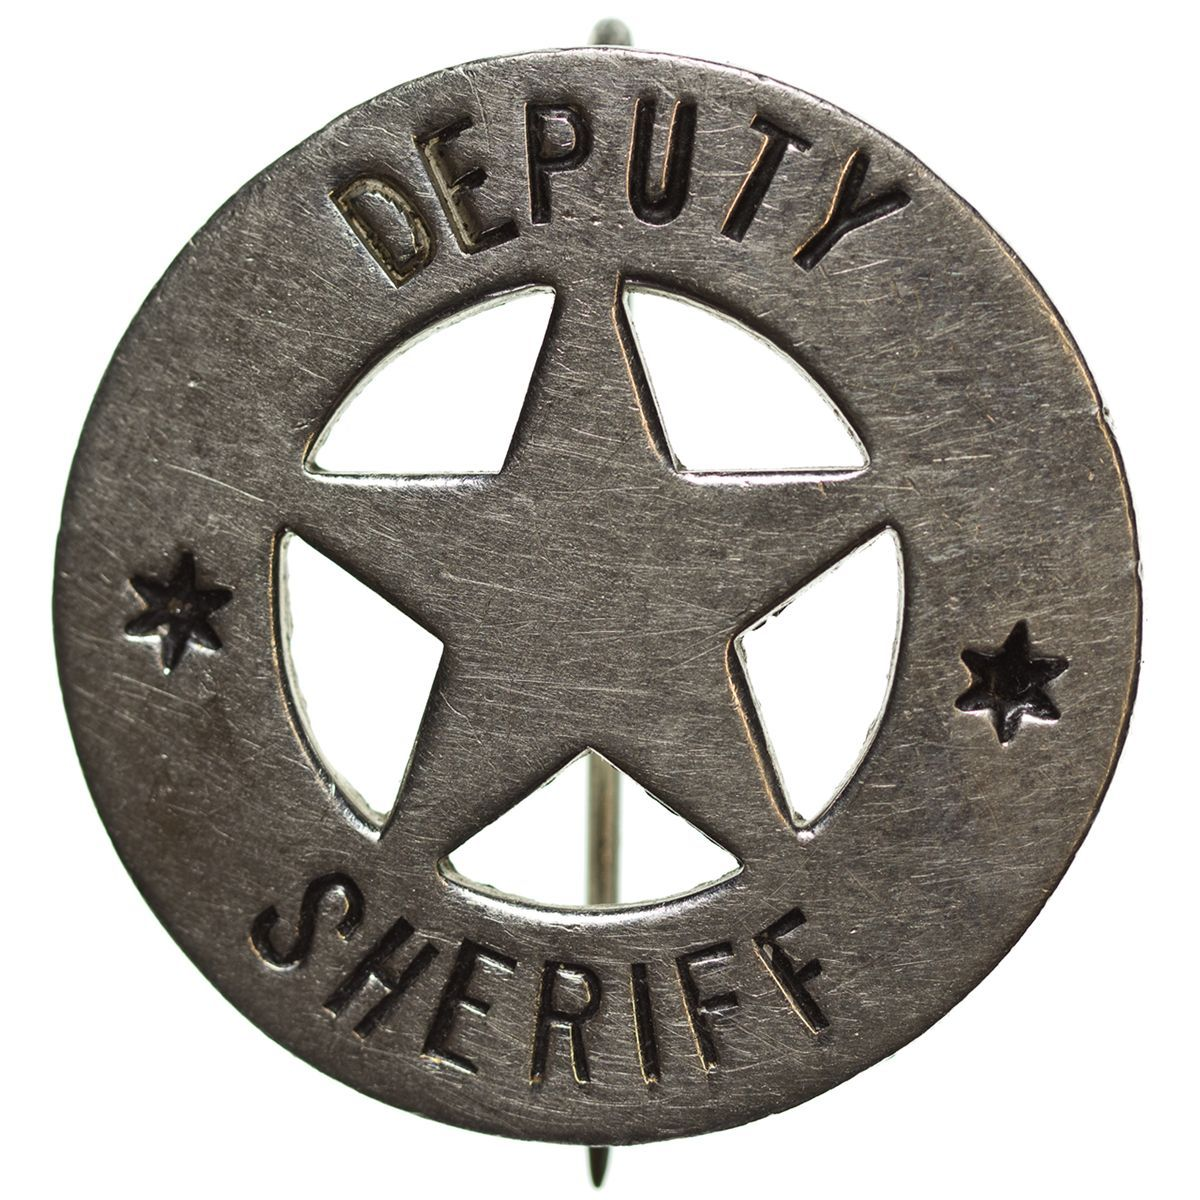 NM - Colfax County,Deputy Sheriff Badge | Law enforcement ...